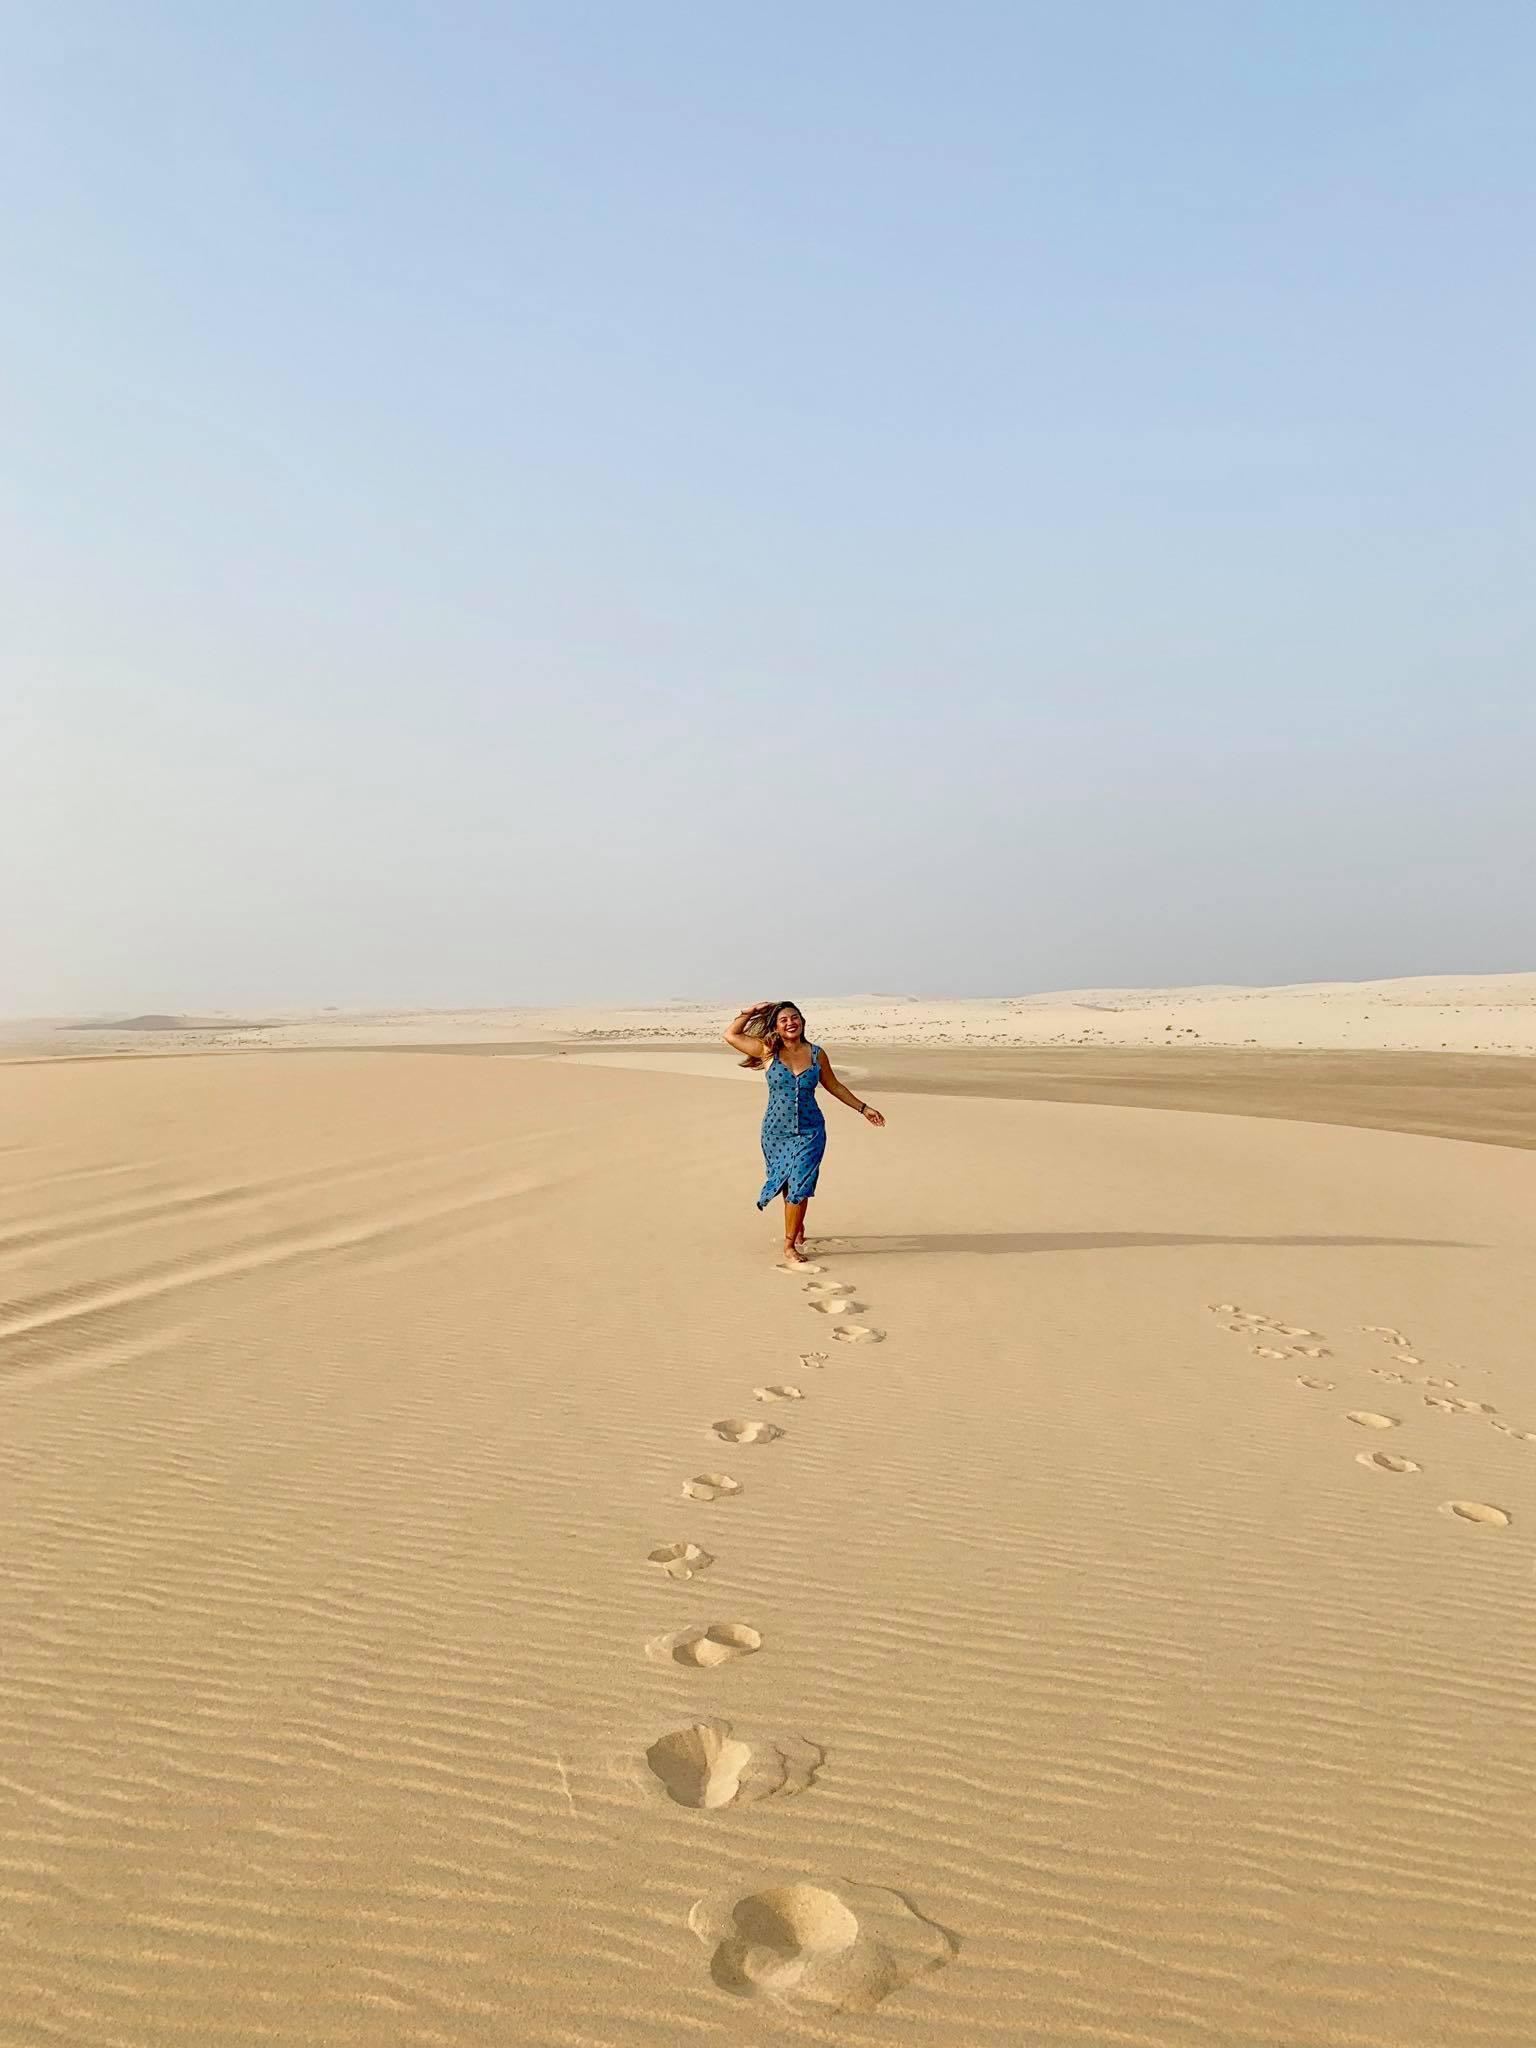 Kach Solo Travels in 2019 I did a 20-hour layover in Doha, QATAR3.jpg